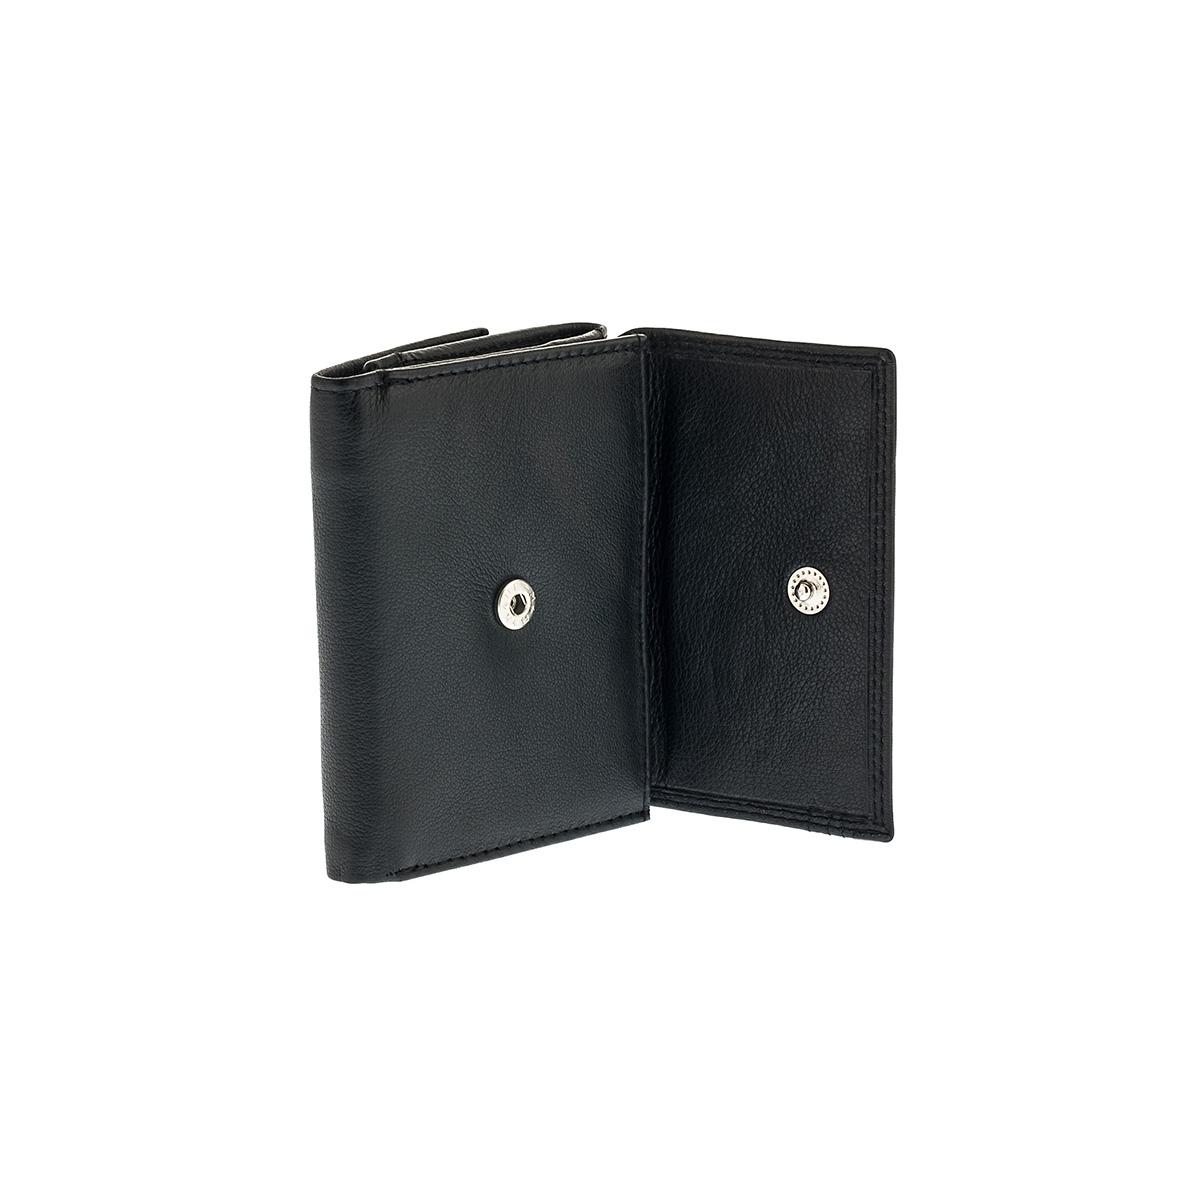 02755d03fd Δερμάτινο Πορτοφόλι Μικρό Με Εξωτερική Θήκη Κερμάτων Lavor RFID 7419 Μαύρο